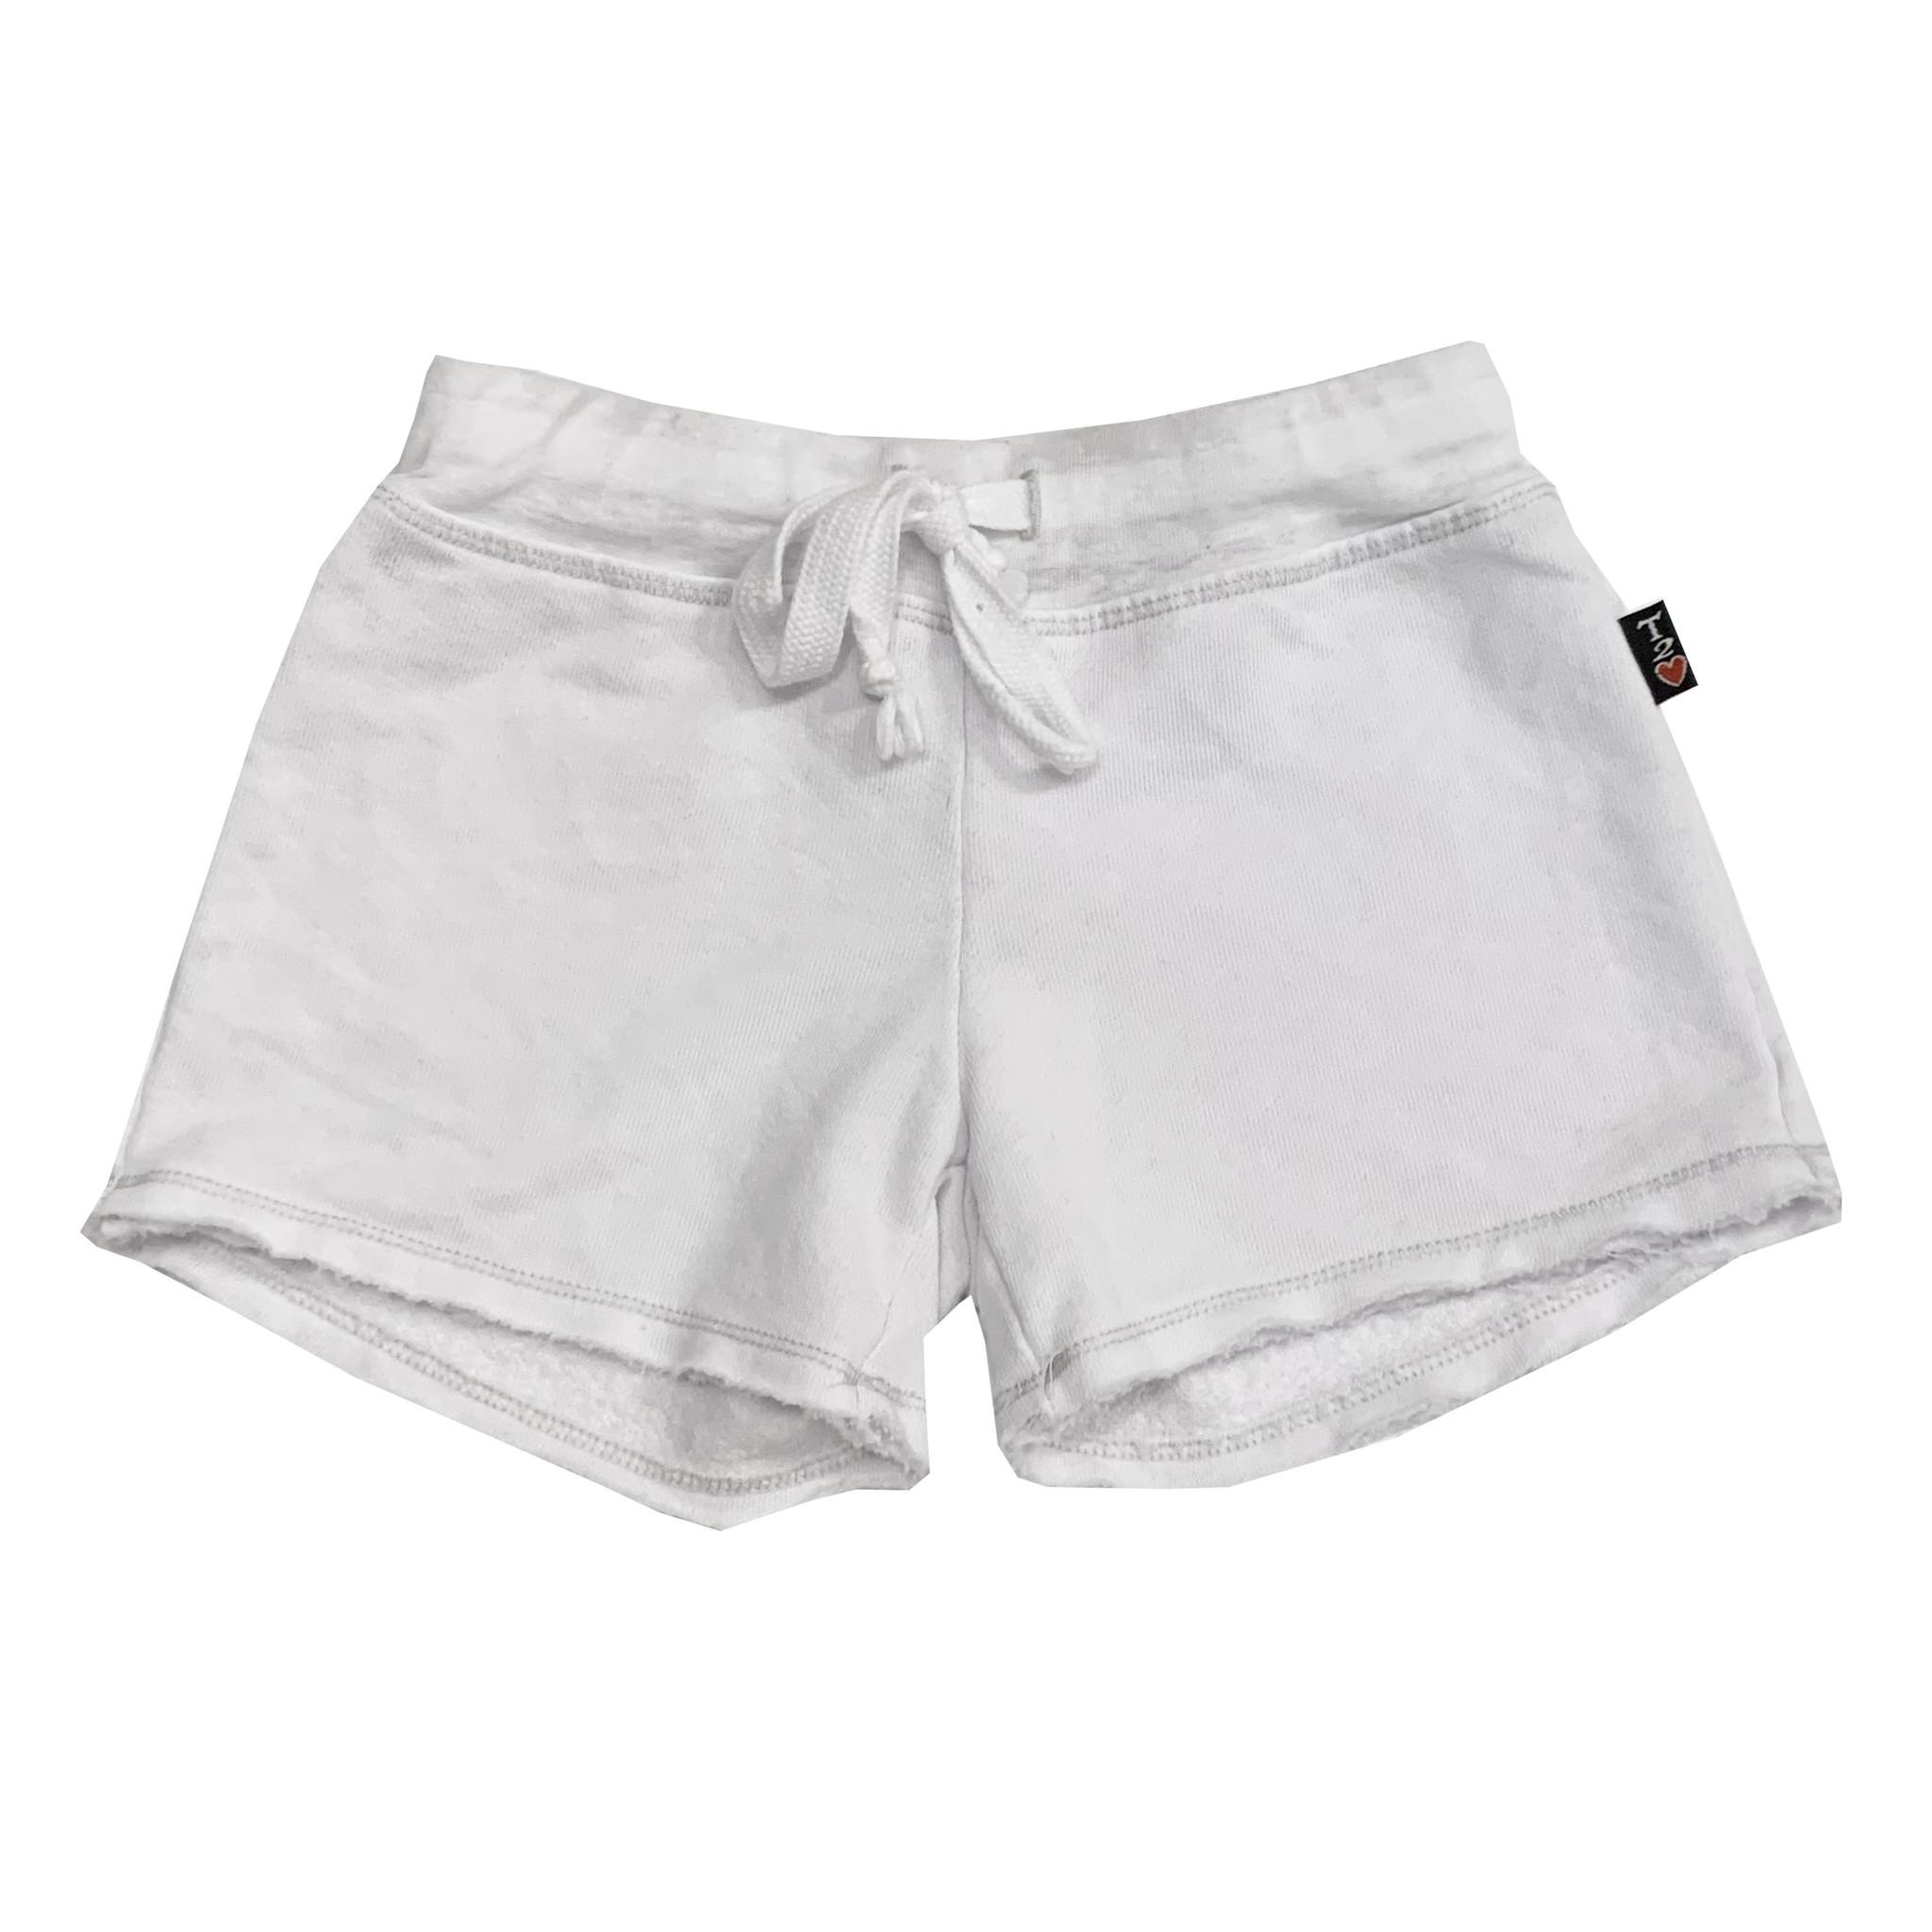 T2Love White Raw Sweat Shorts